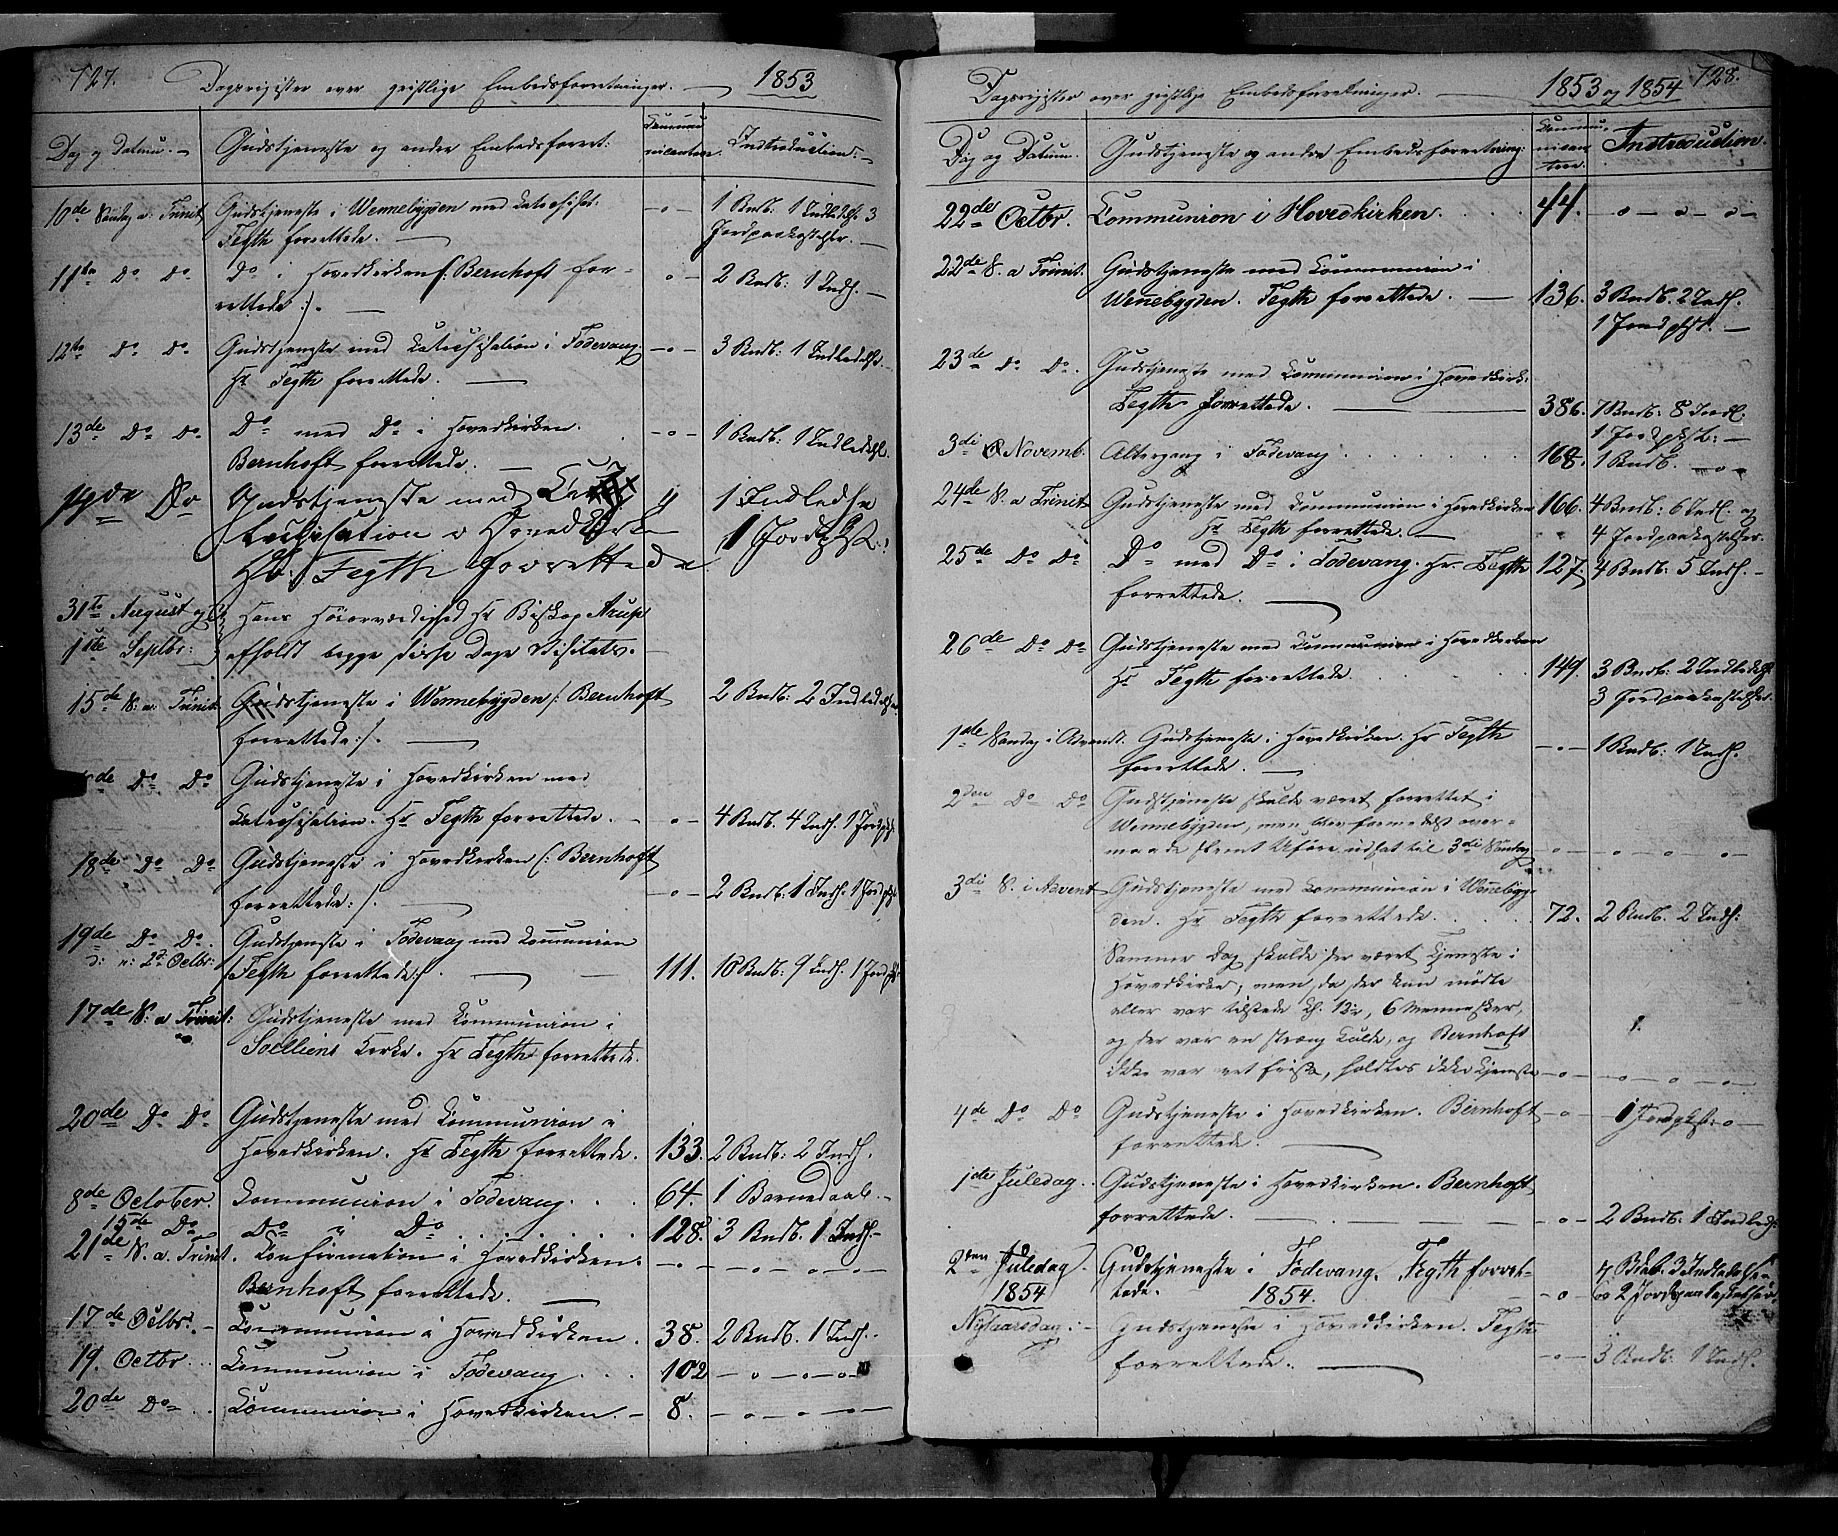 SAH, Ringebu prestekontor, Ministerialbok nr. 6, 1848-1859, s. 727-728